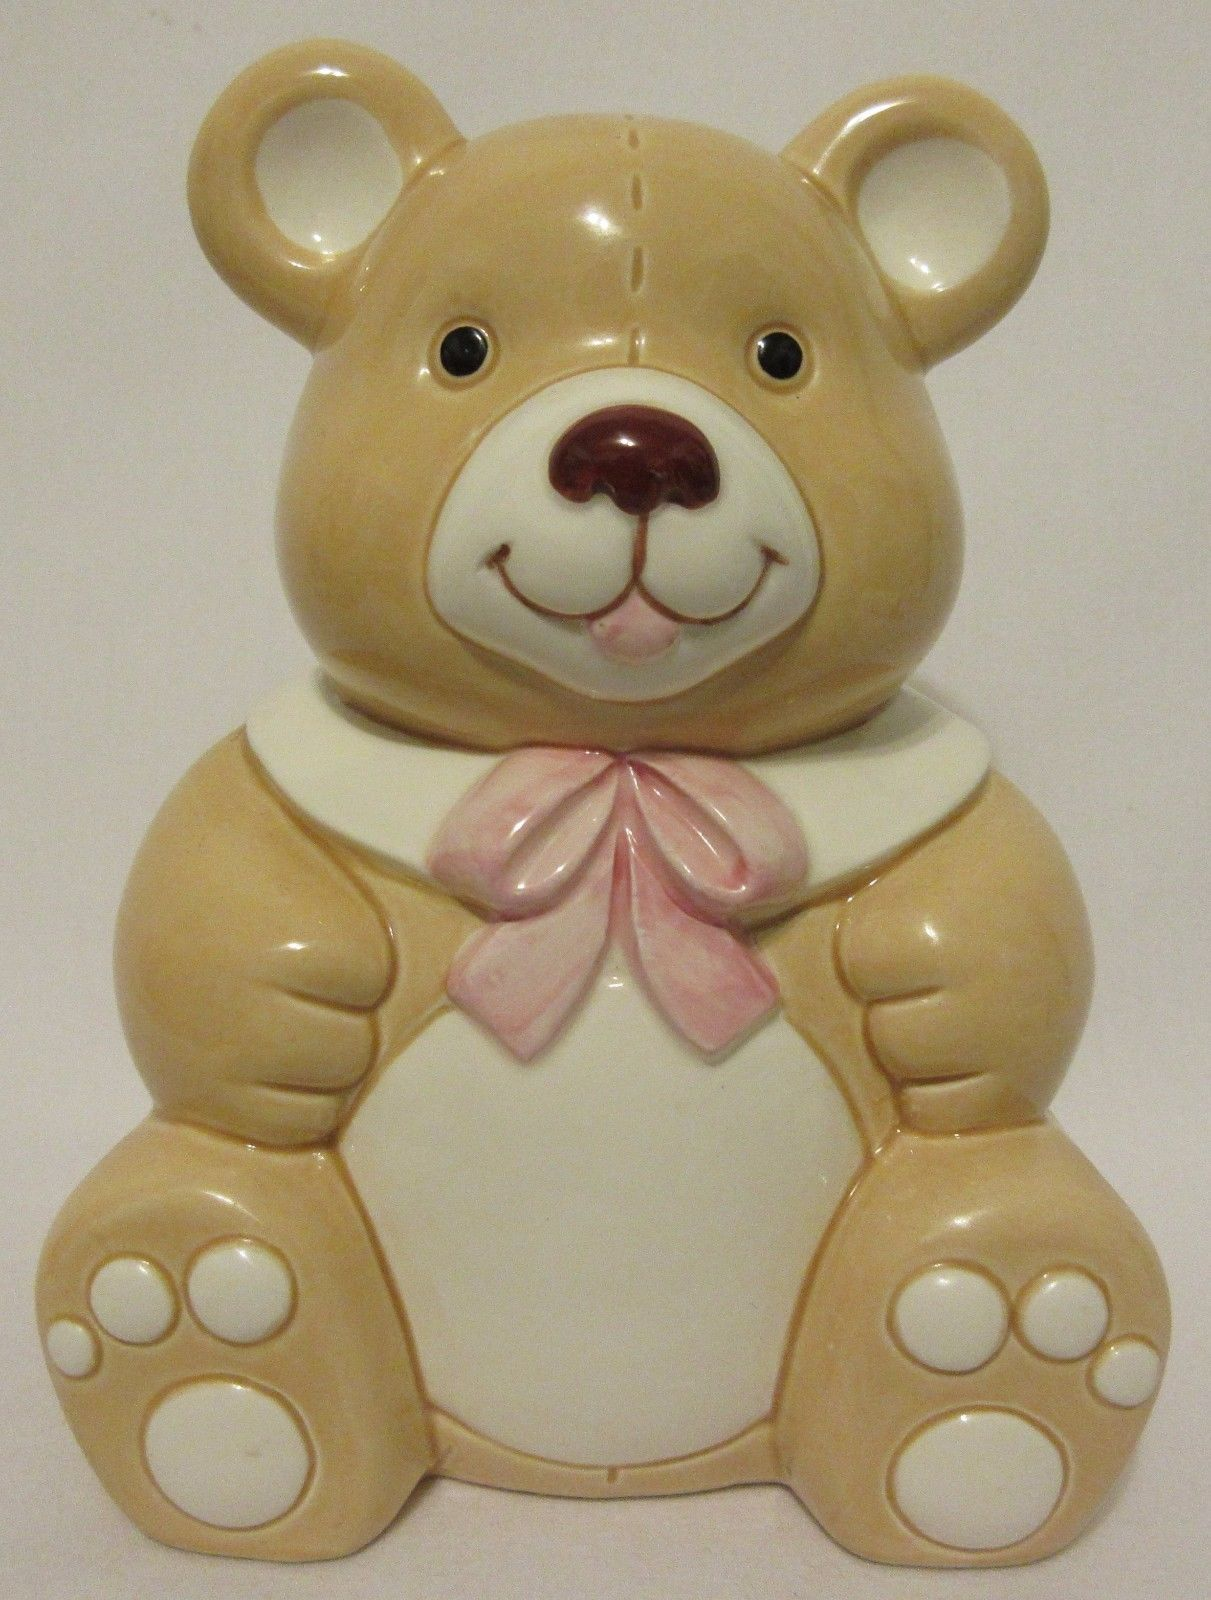 vtg geo z lefton teddy bear bank porcelain and 46 similar items